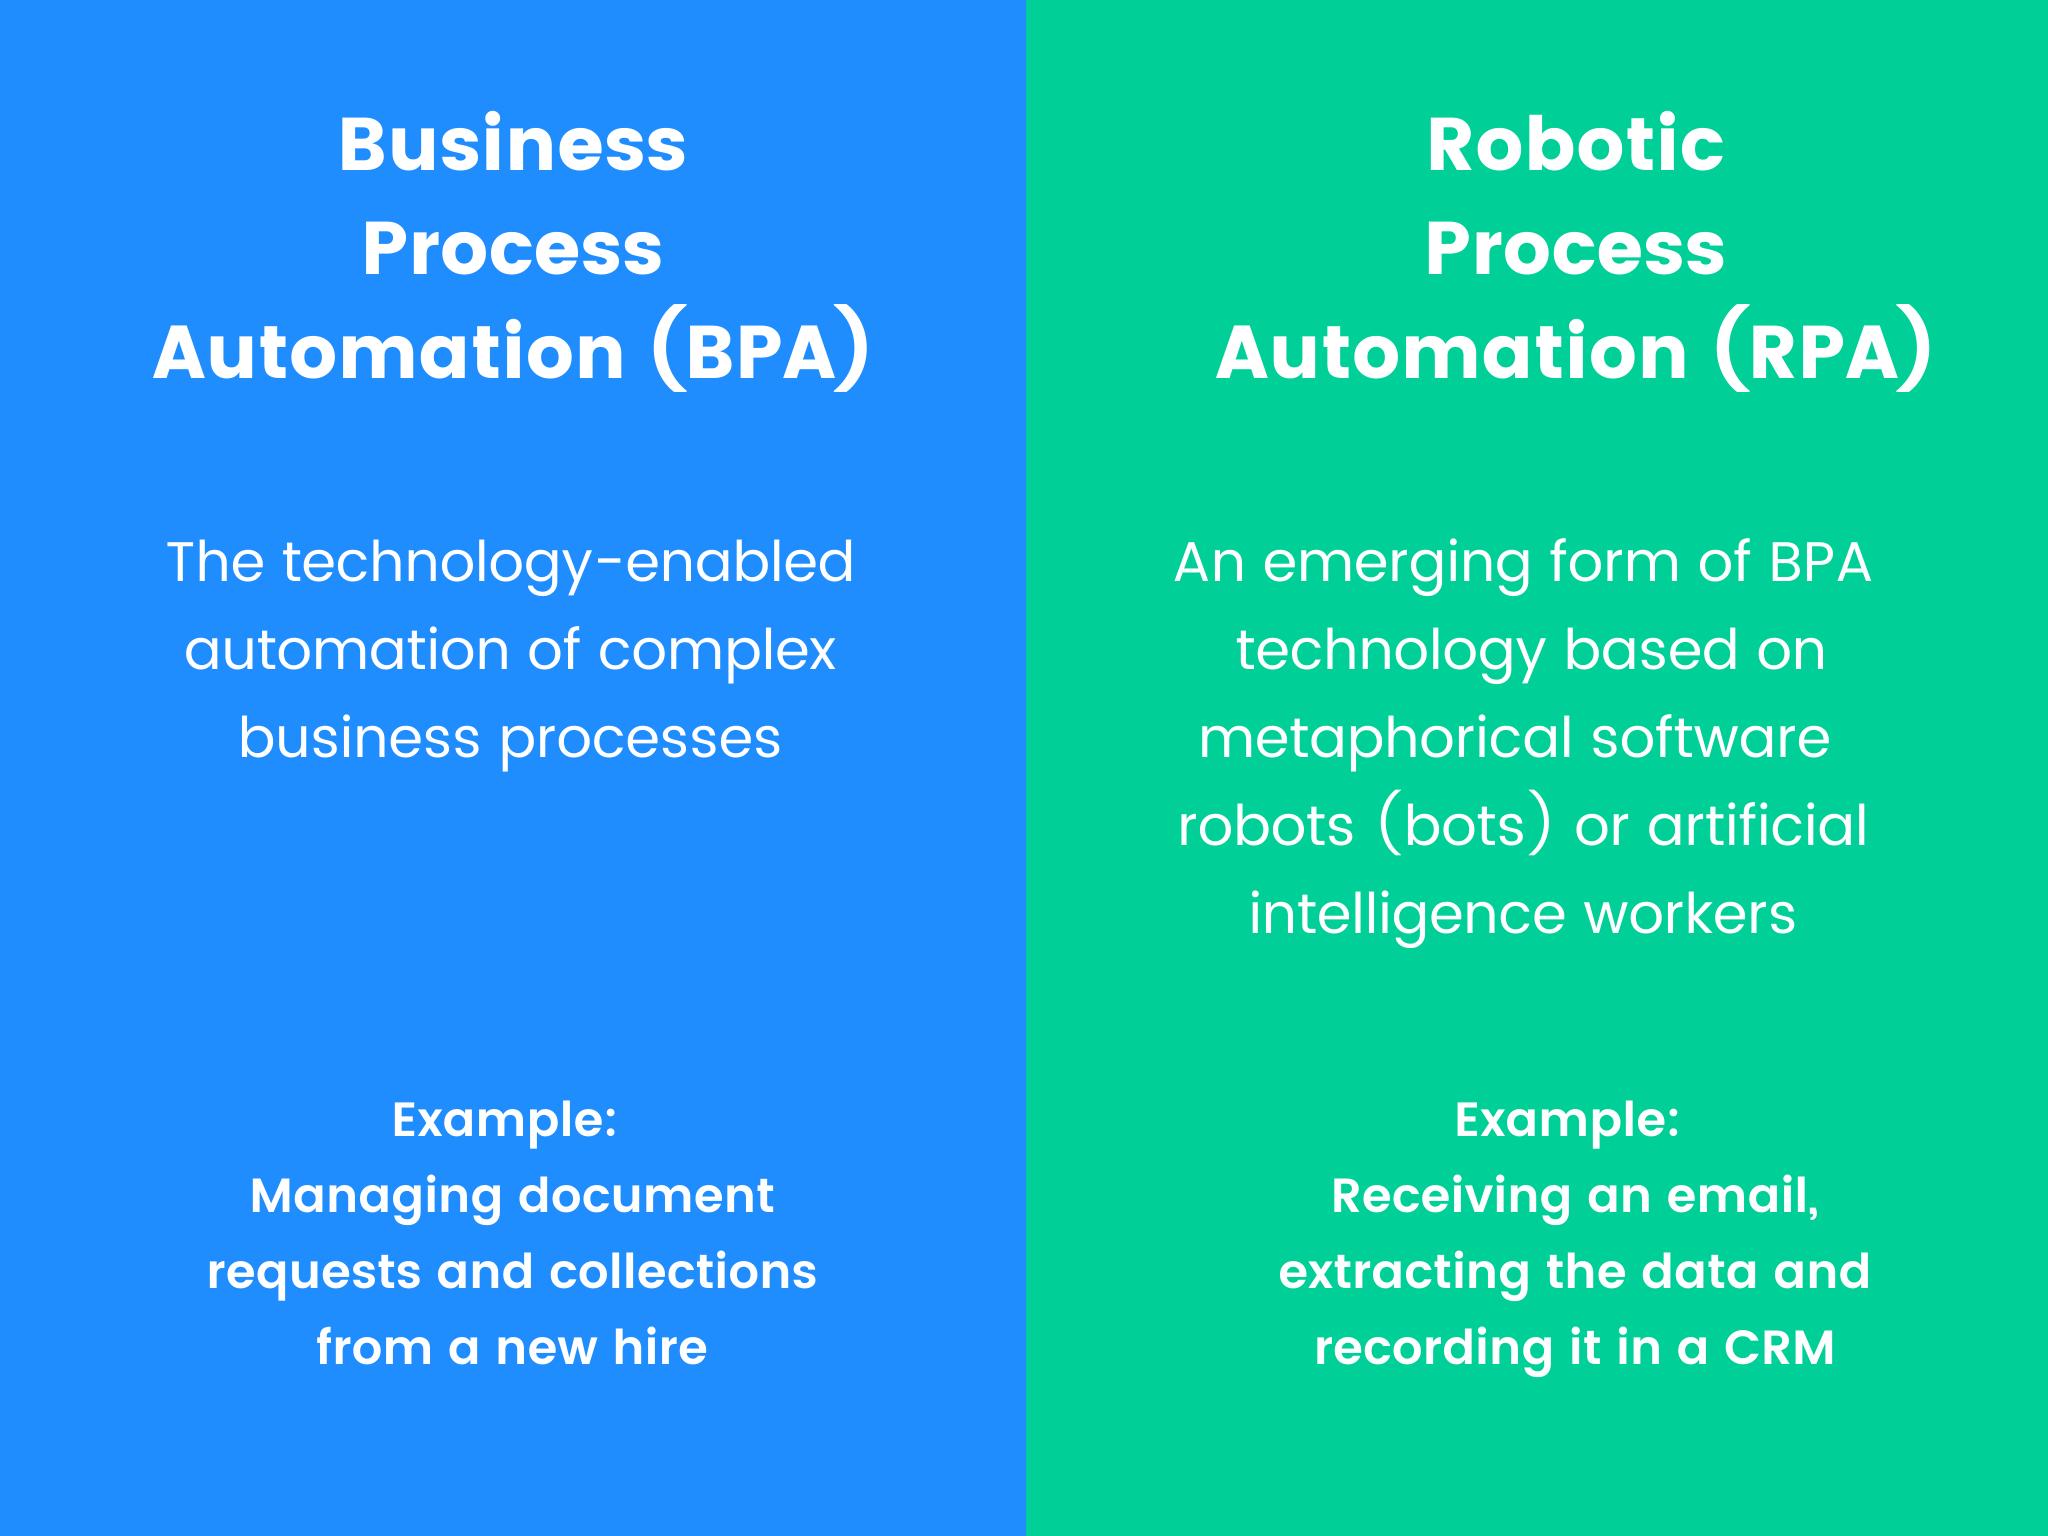 business process automation vs robotic process automation